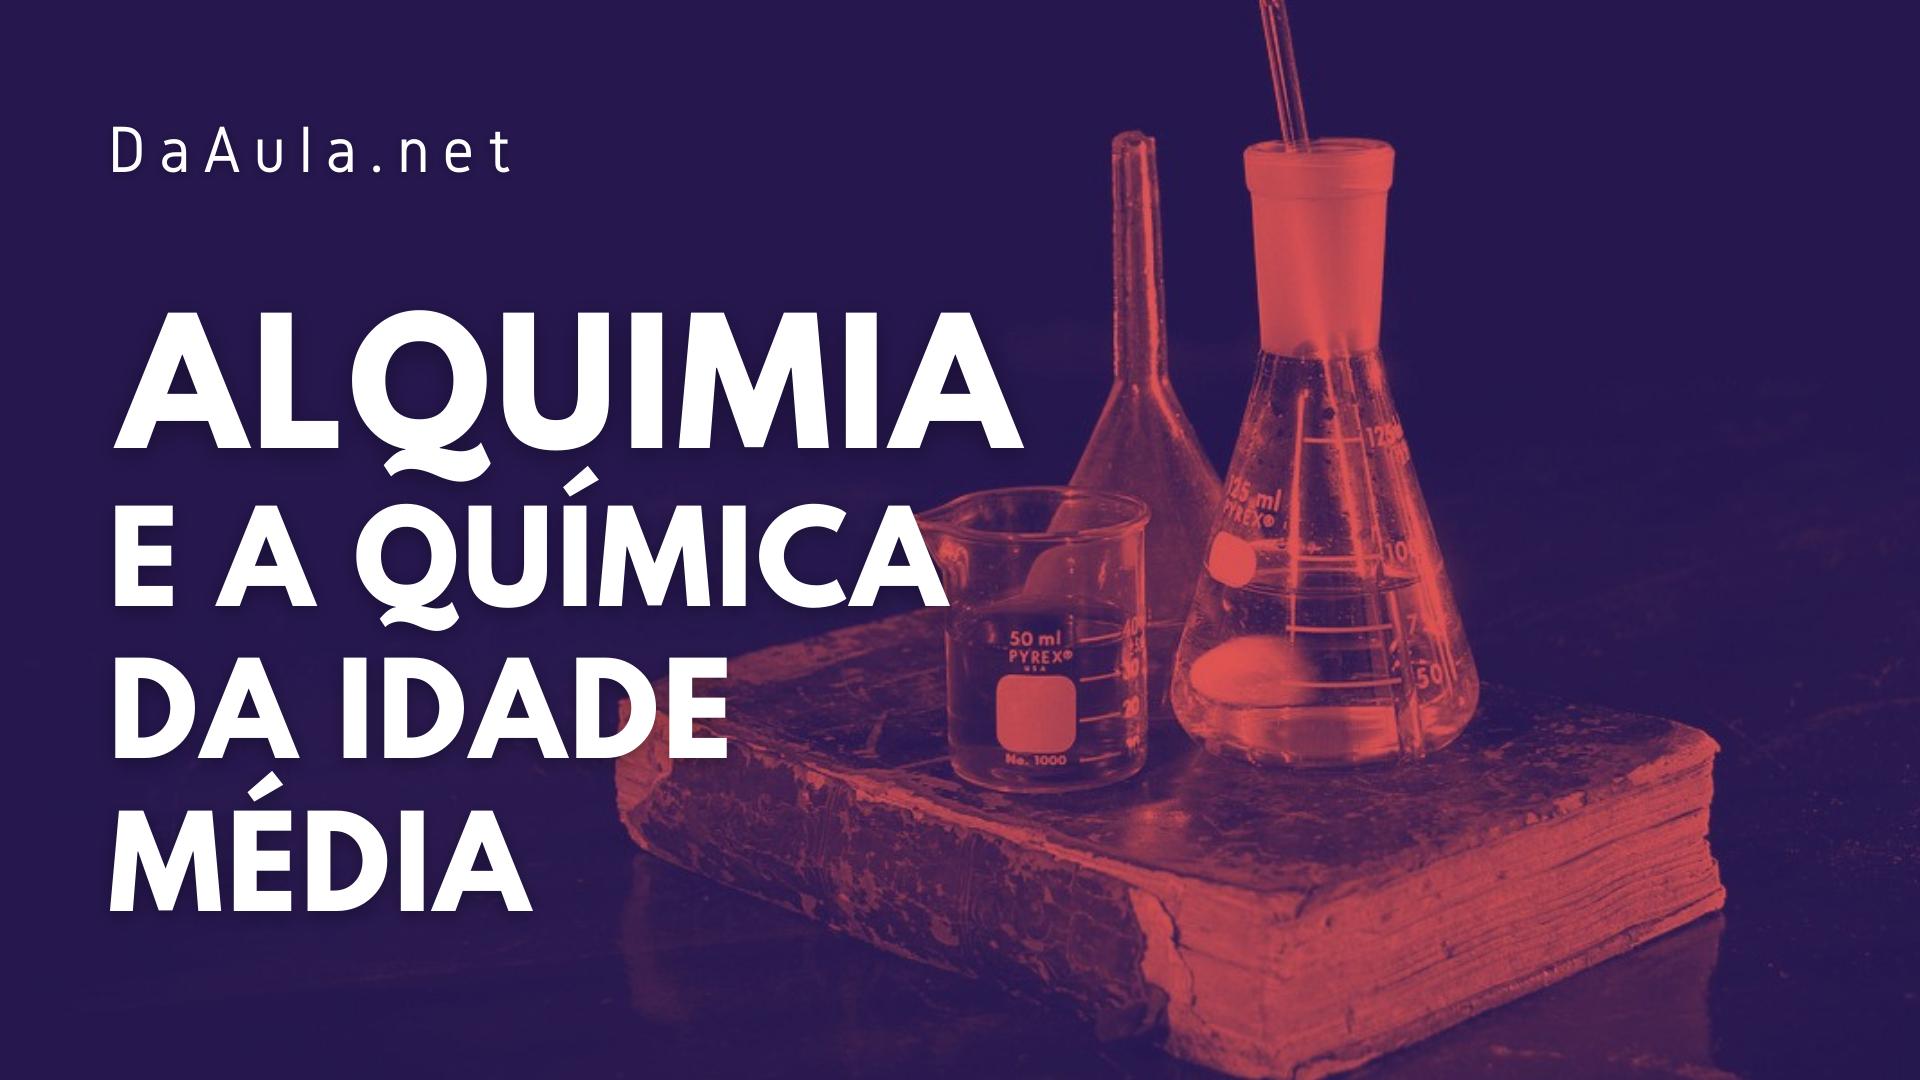 Alquimia - A Química da Era Medieval